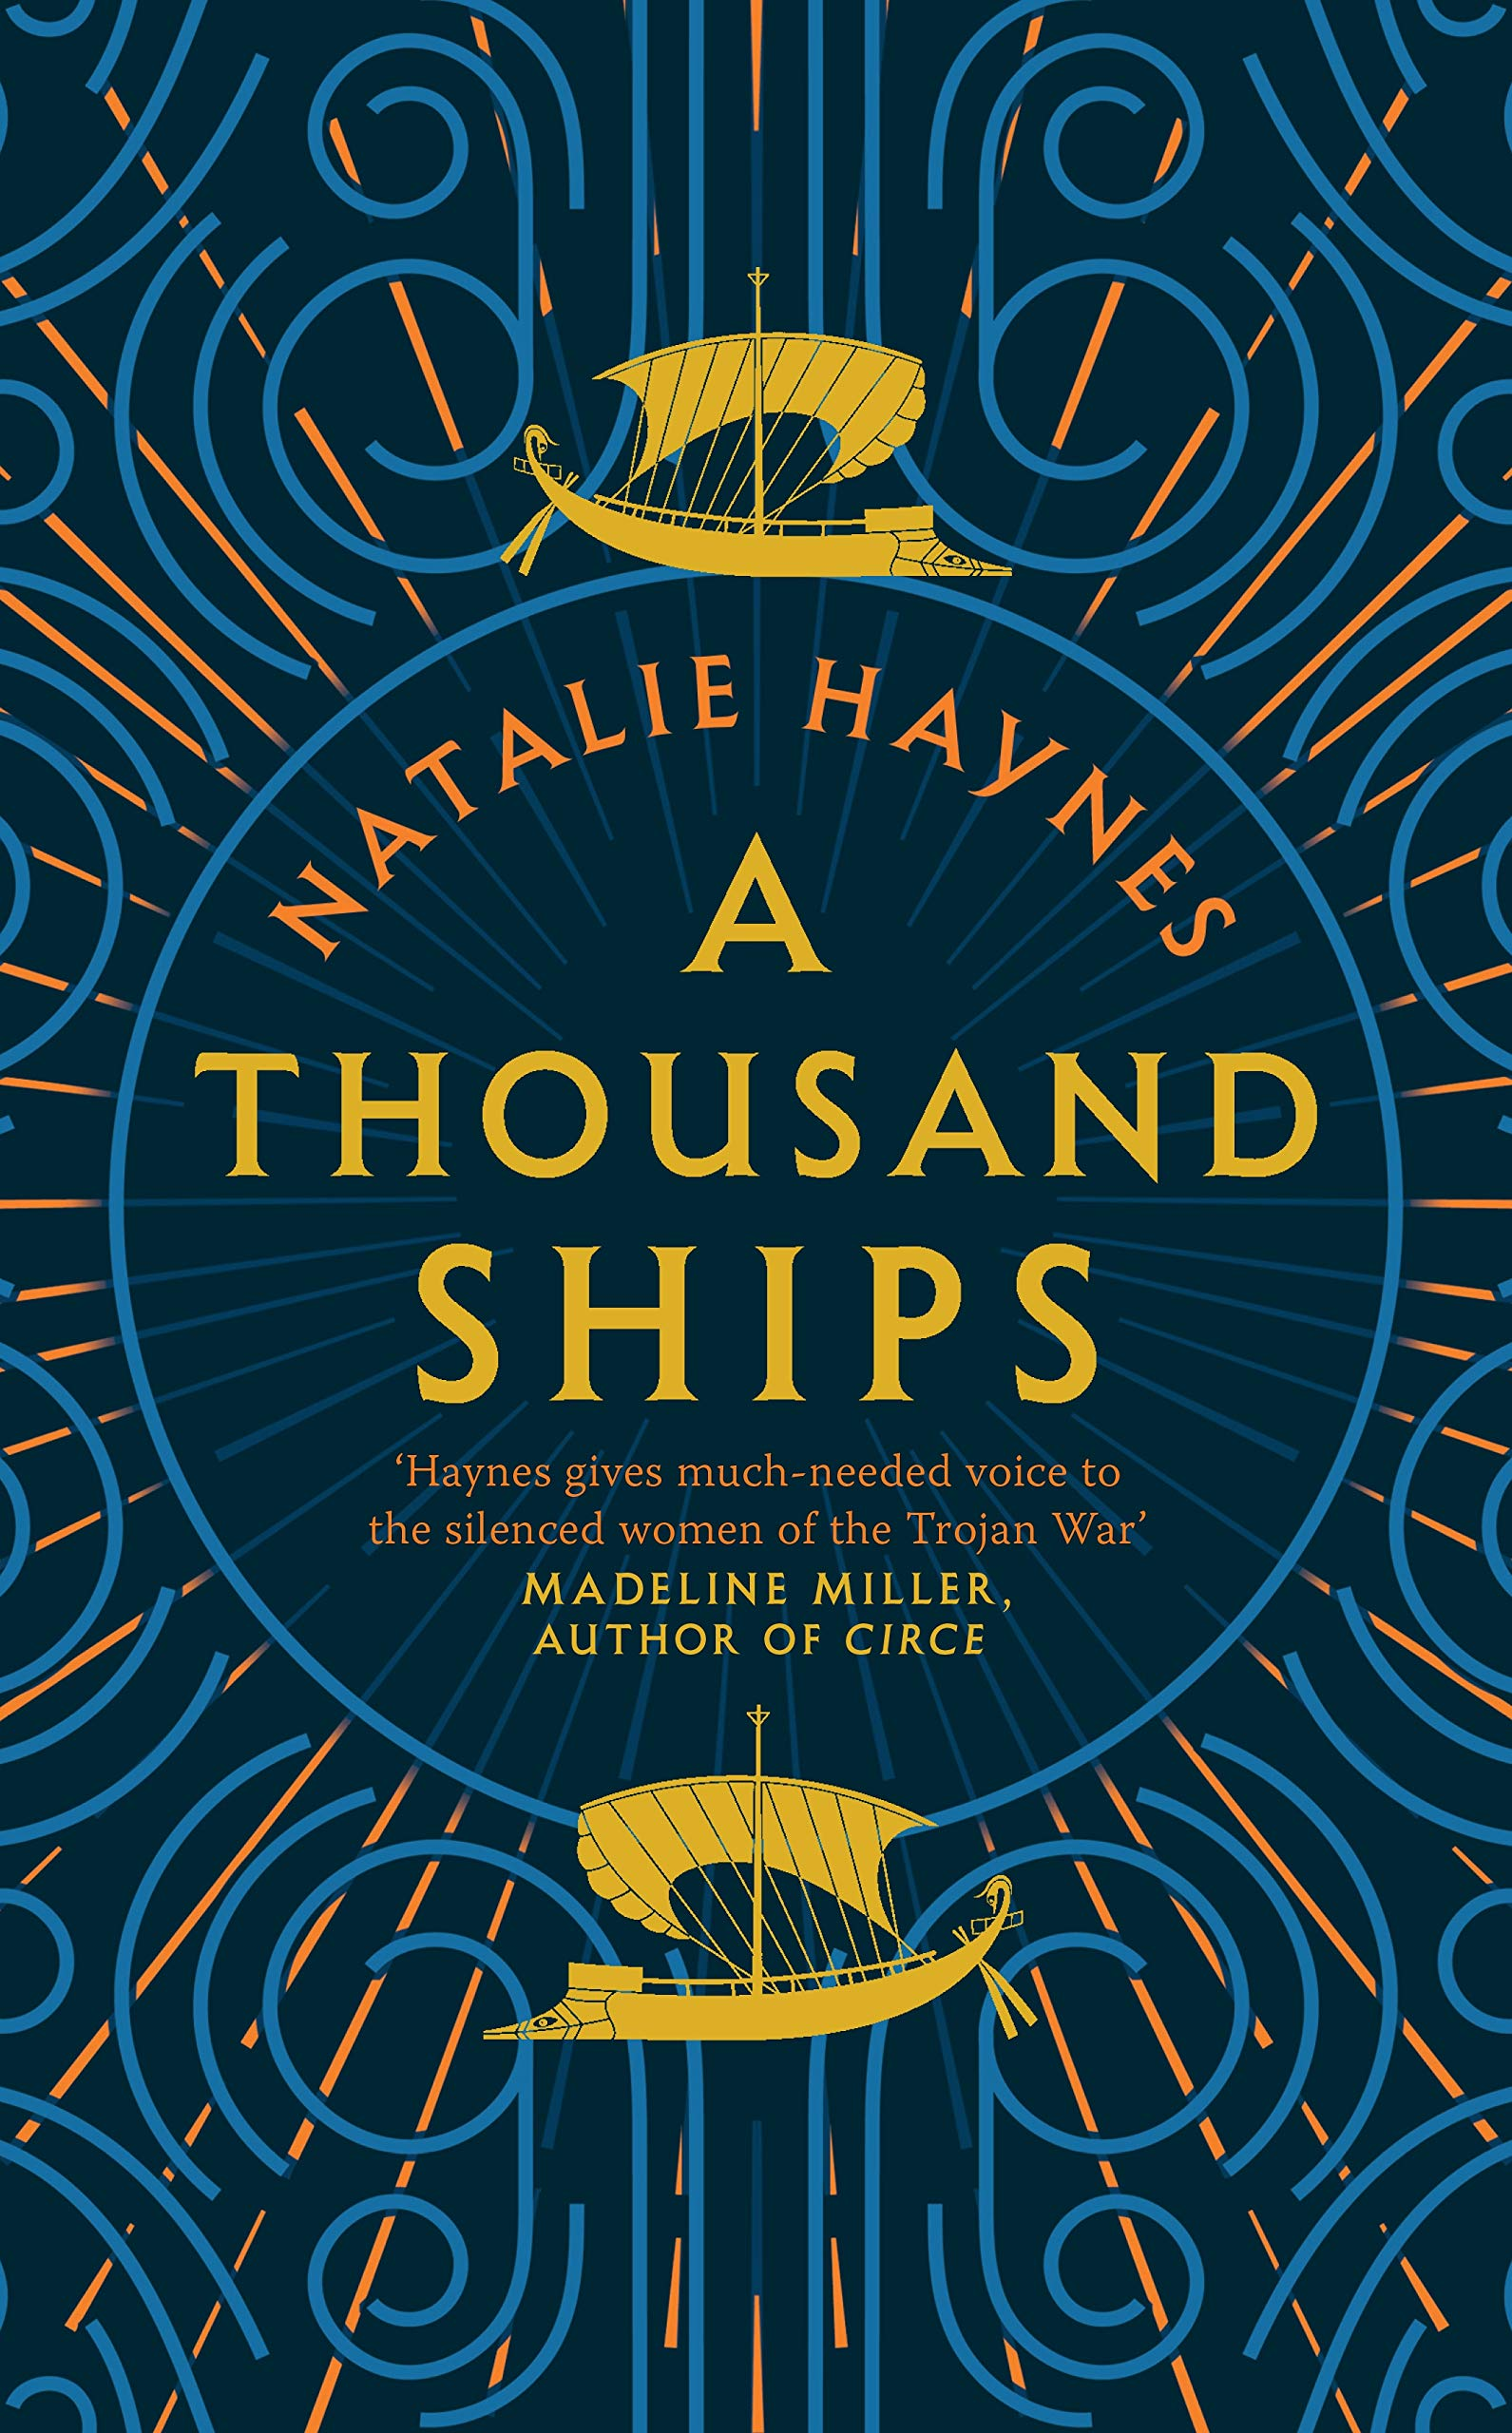 A Thousand Ships: Amazon.co.uk: Haynes, Natalie: 9781509836192: Books